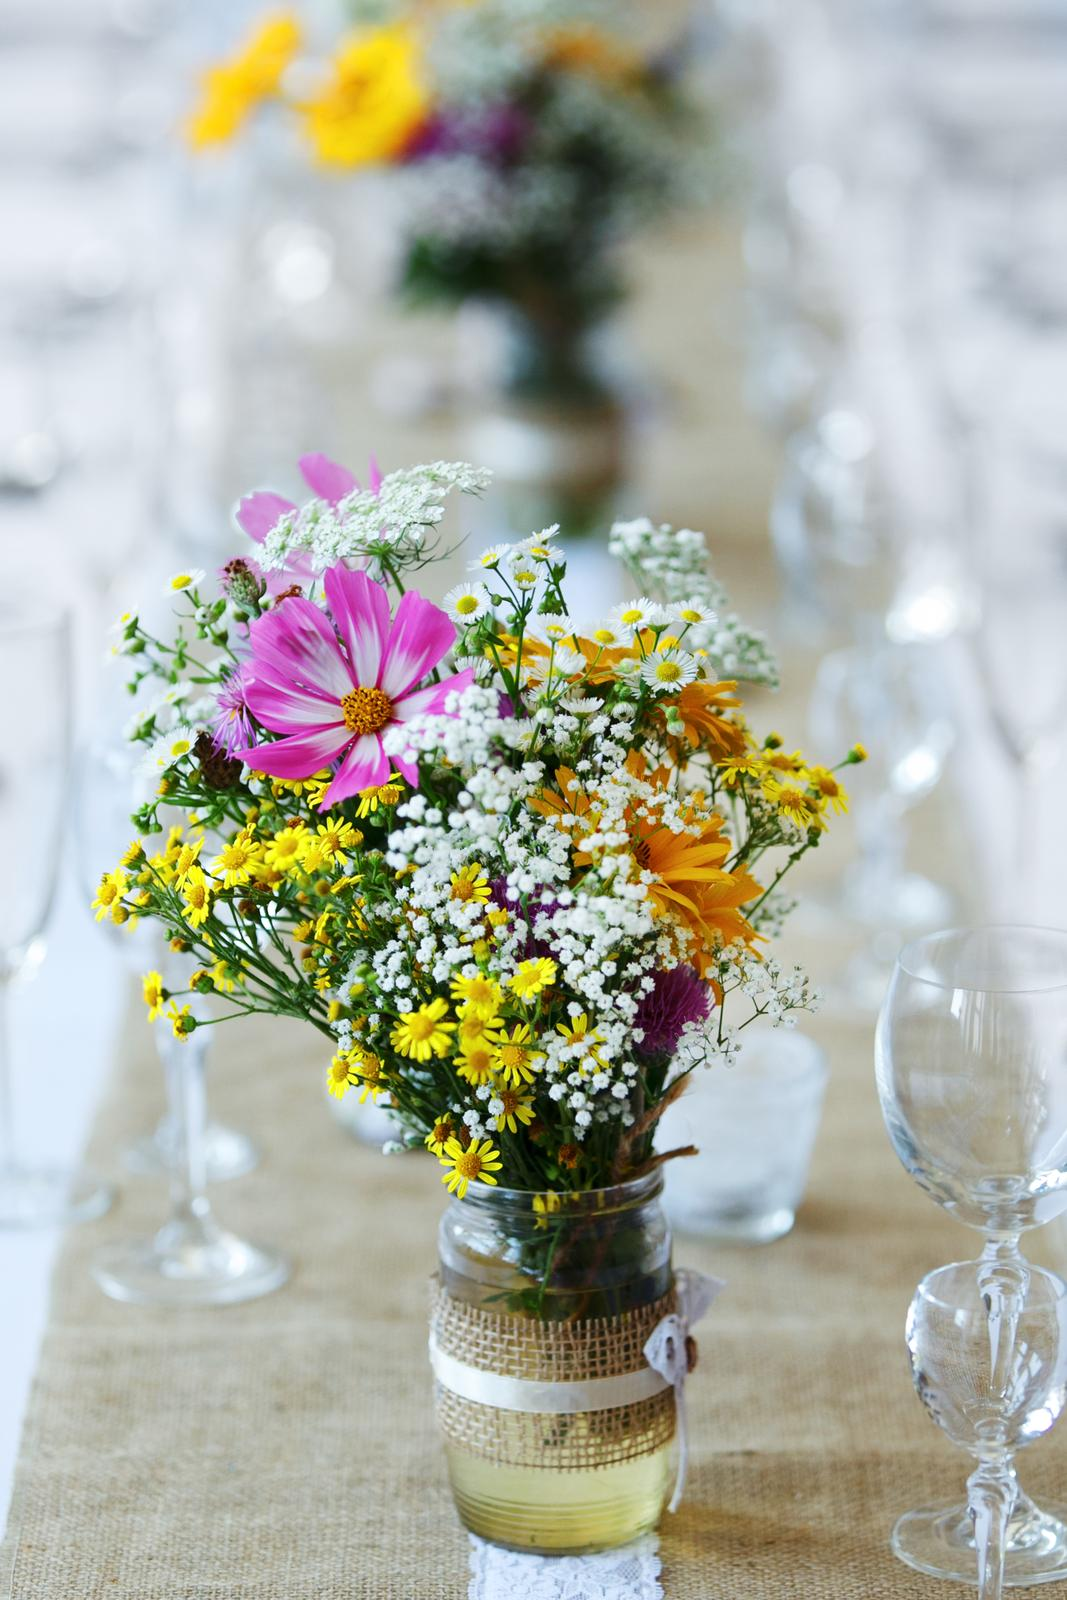 gypsomilka, pár bielych chryzantém... - Obrázok č. 3